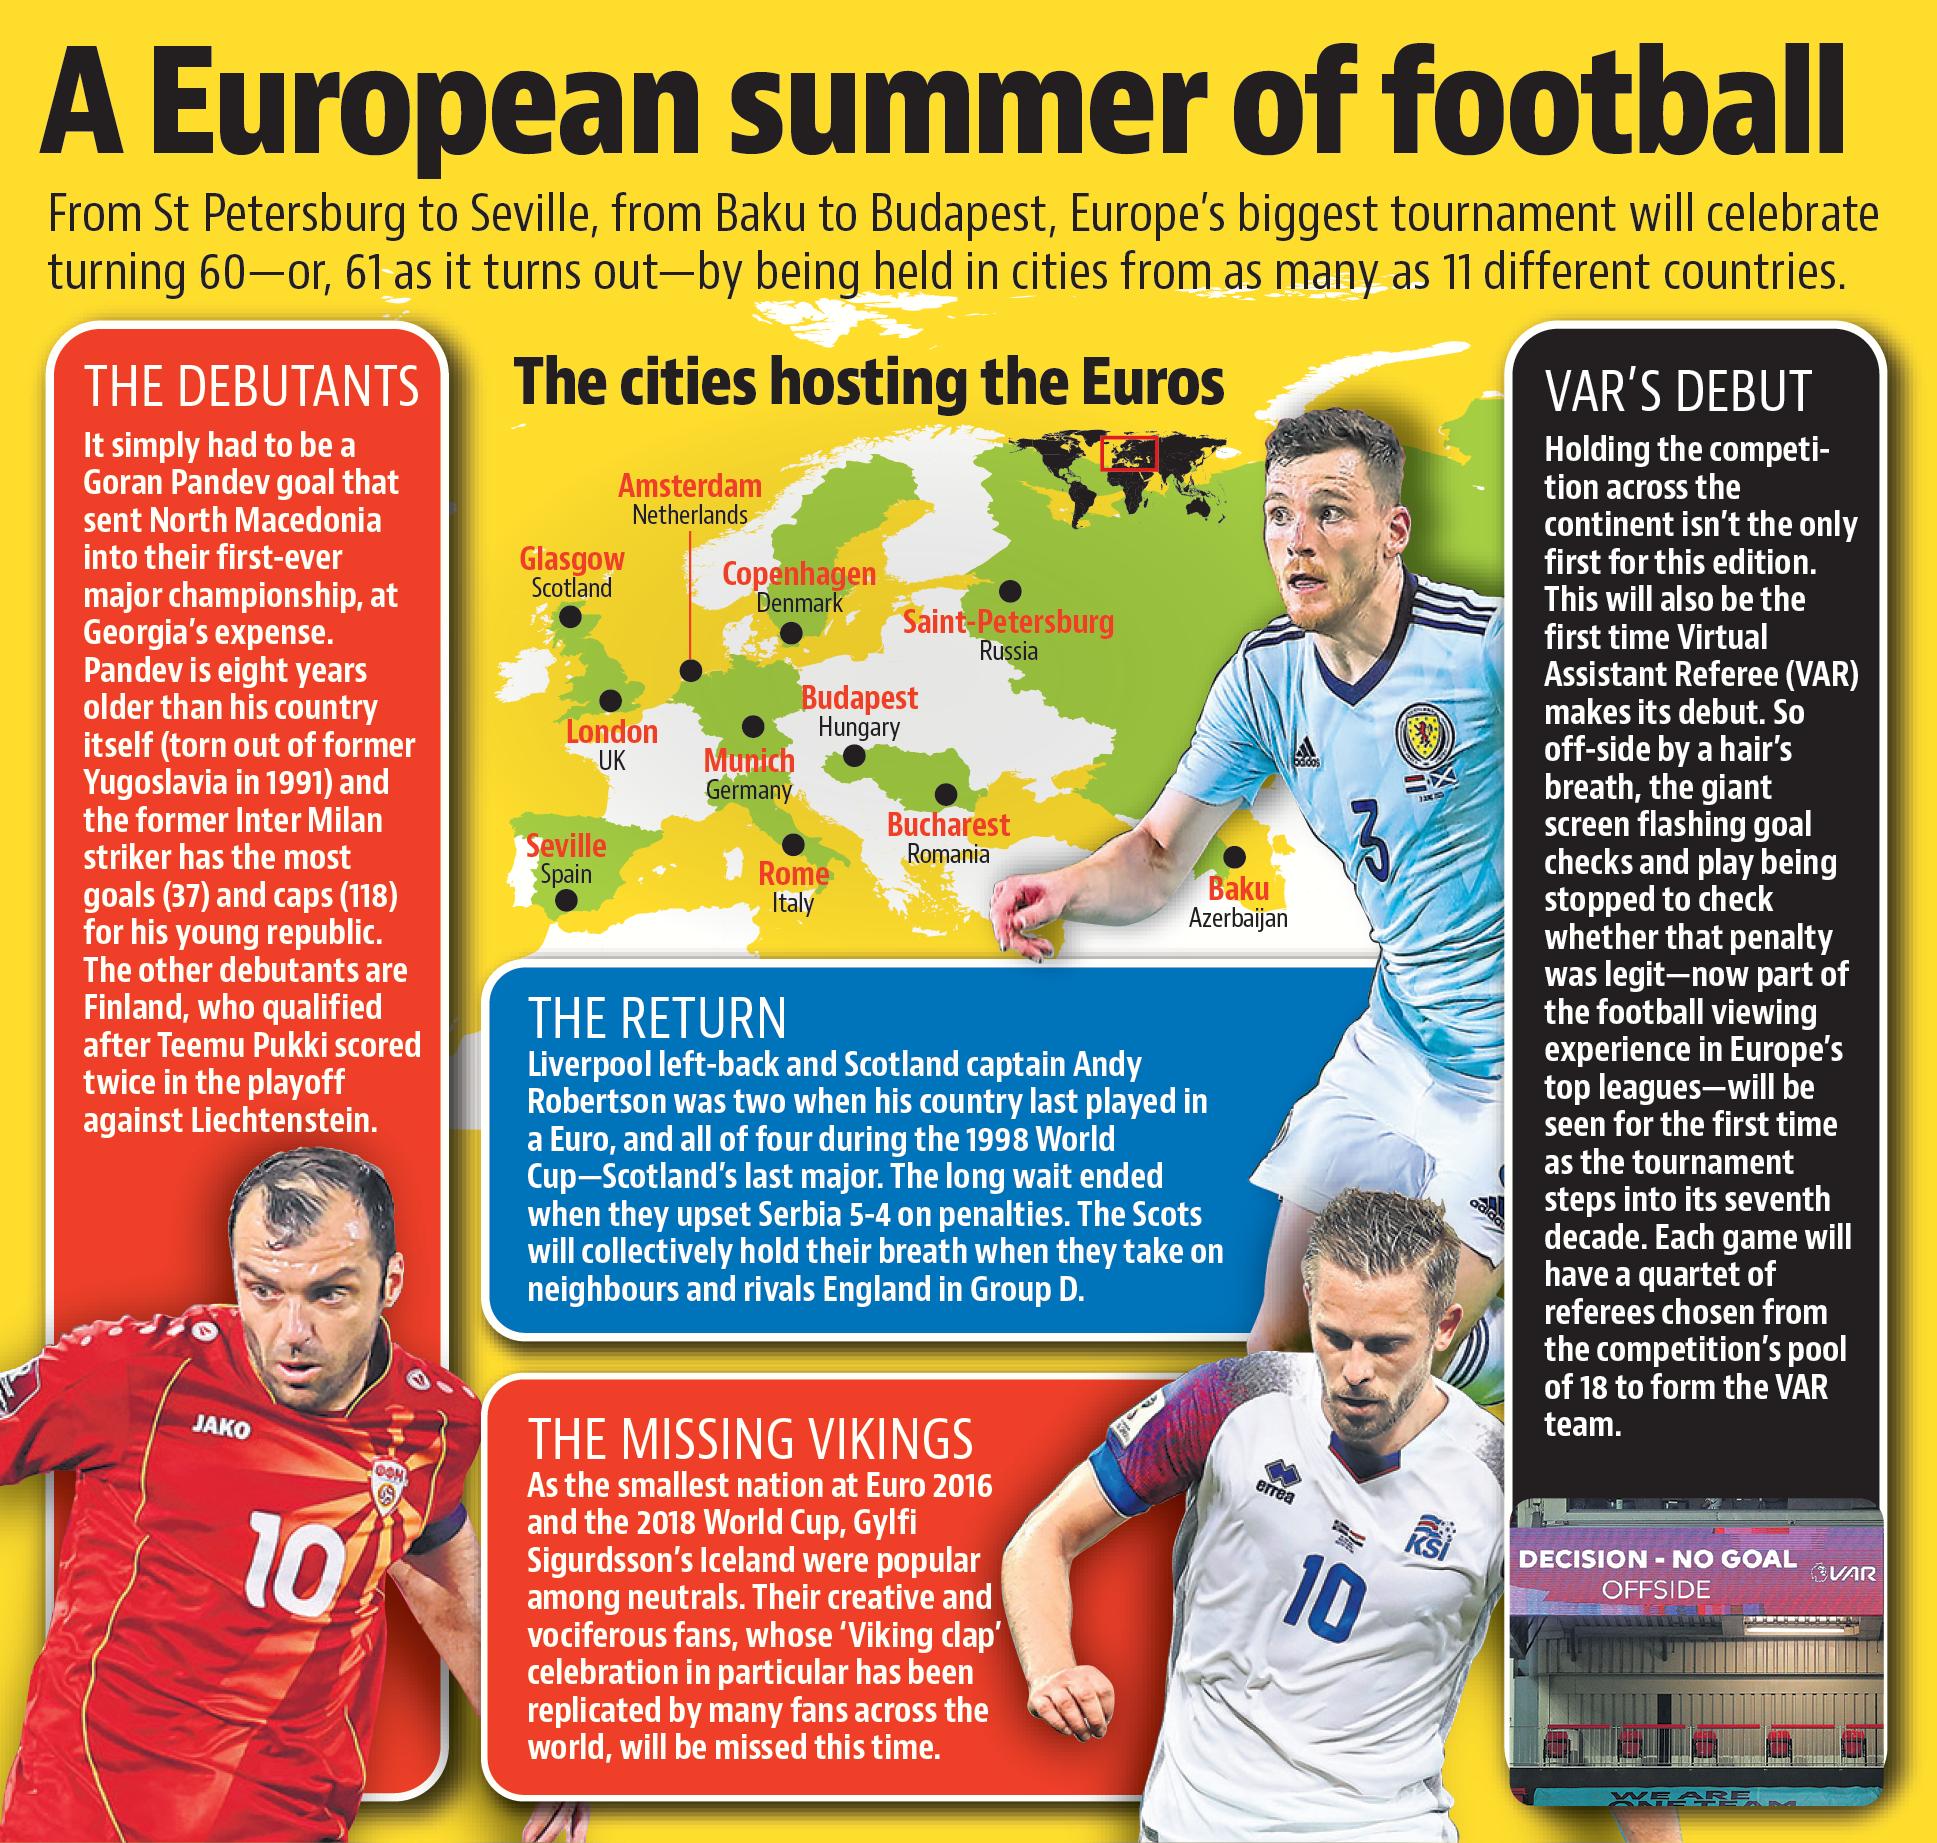 A European Summer of Football.(HT Photo)